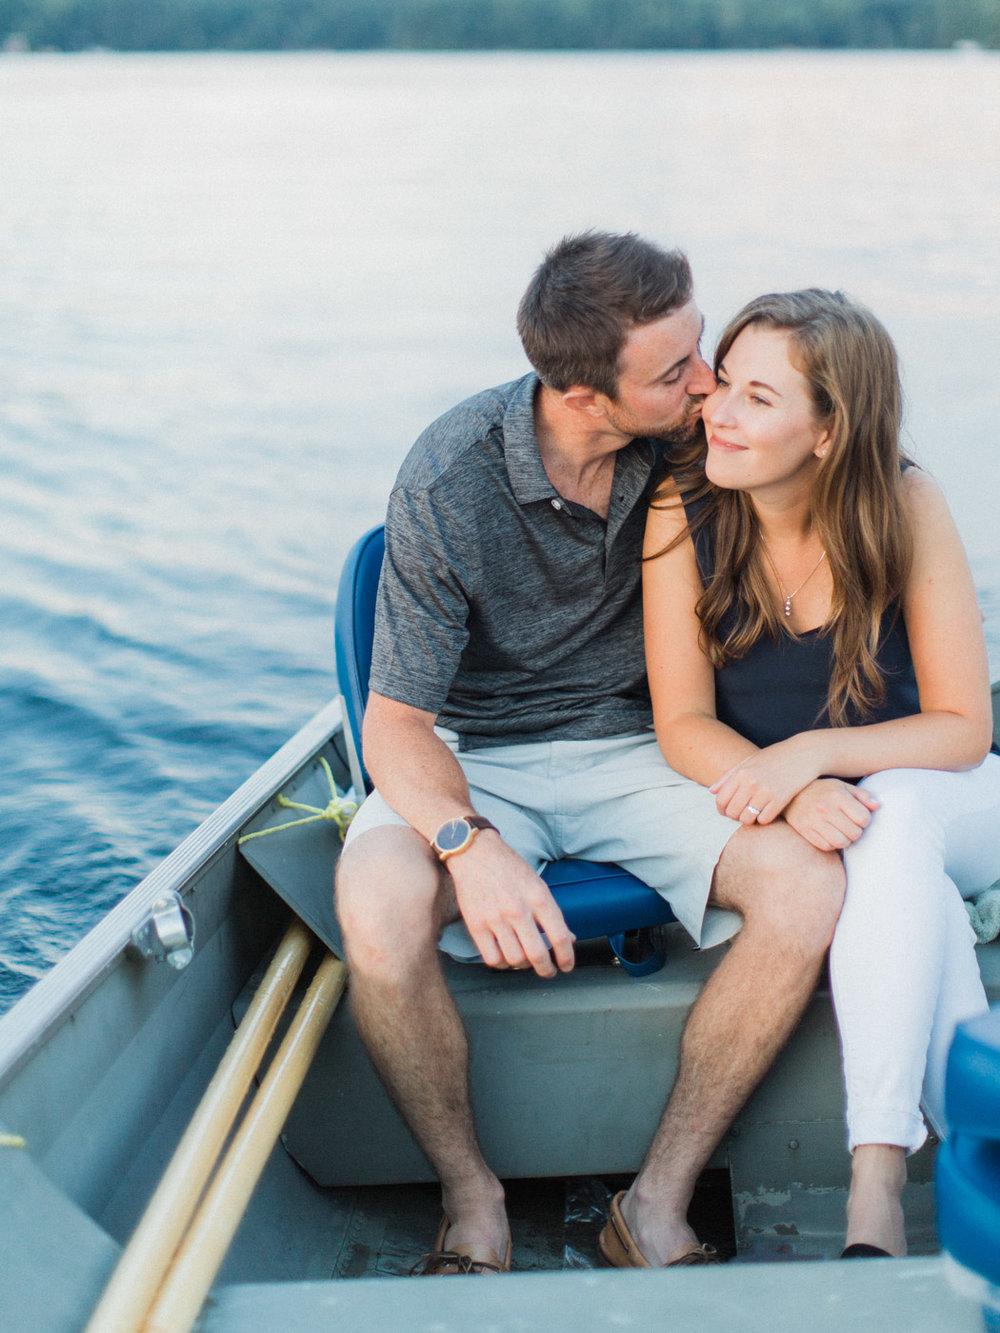 muskoka-wedding-photographer-adventurous-couples-engagement-session-lake-95.jpg